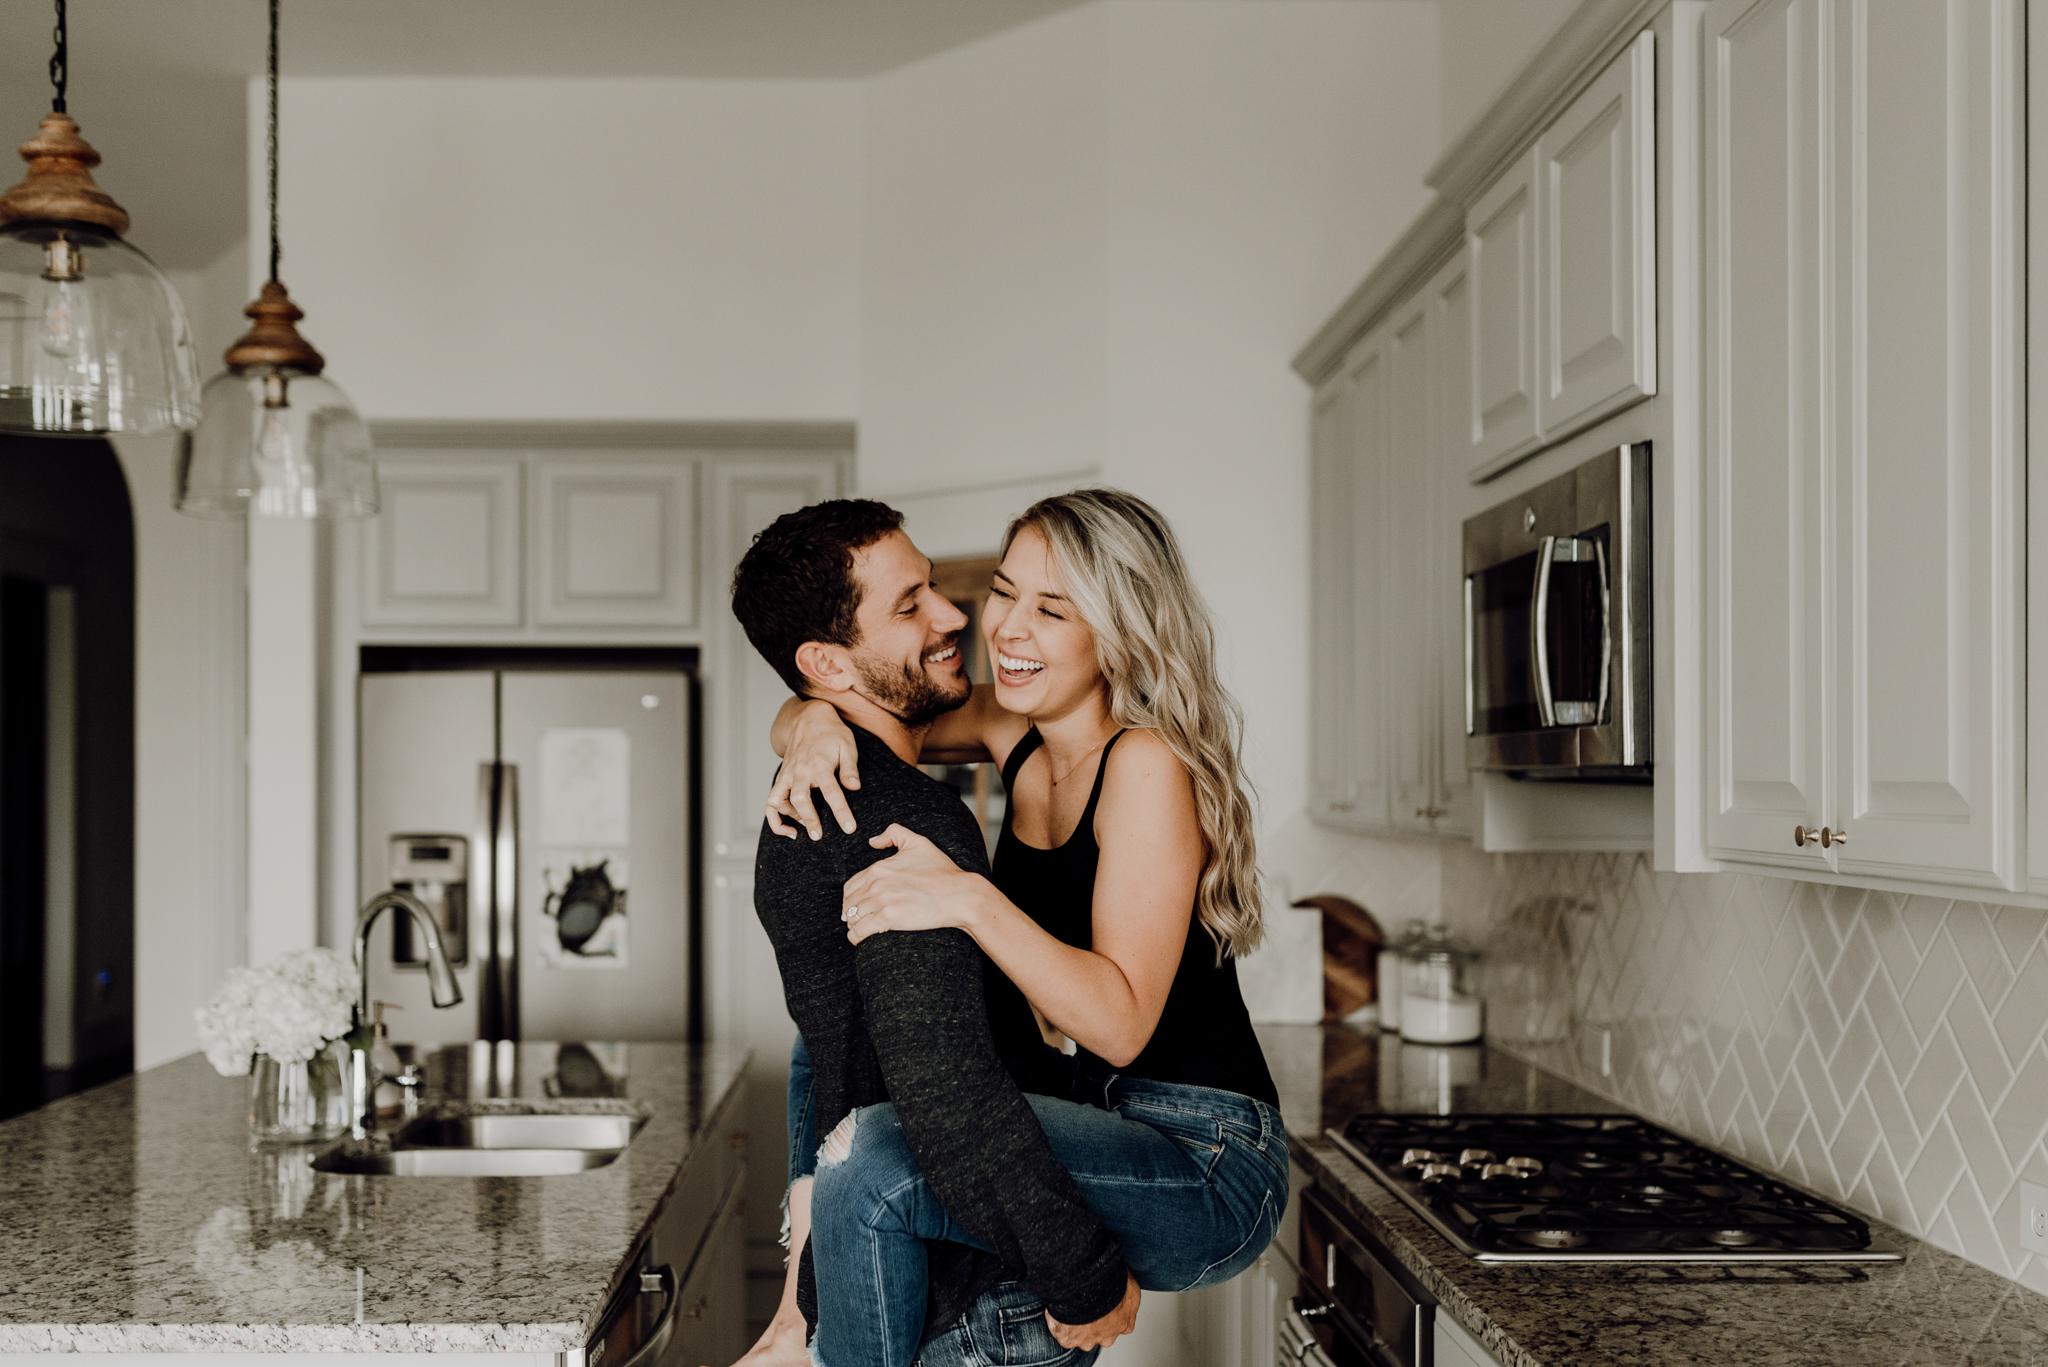 Houston Wedding Photographer-Houston In Home Engagement Session- Houston Wedding Photographer -Kristen Giles Photography-72.jpg